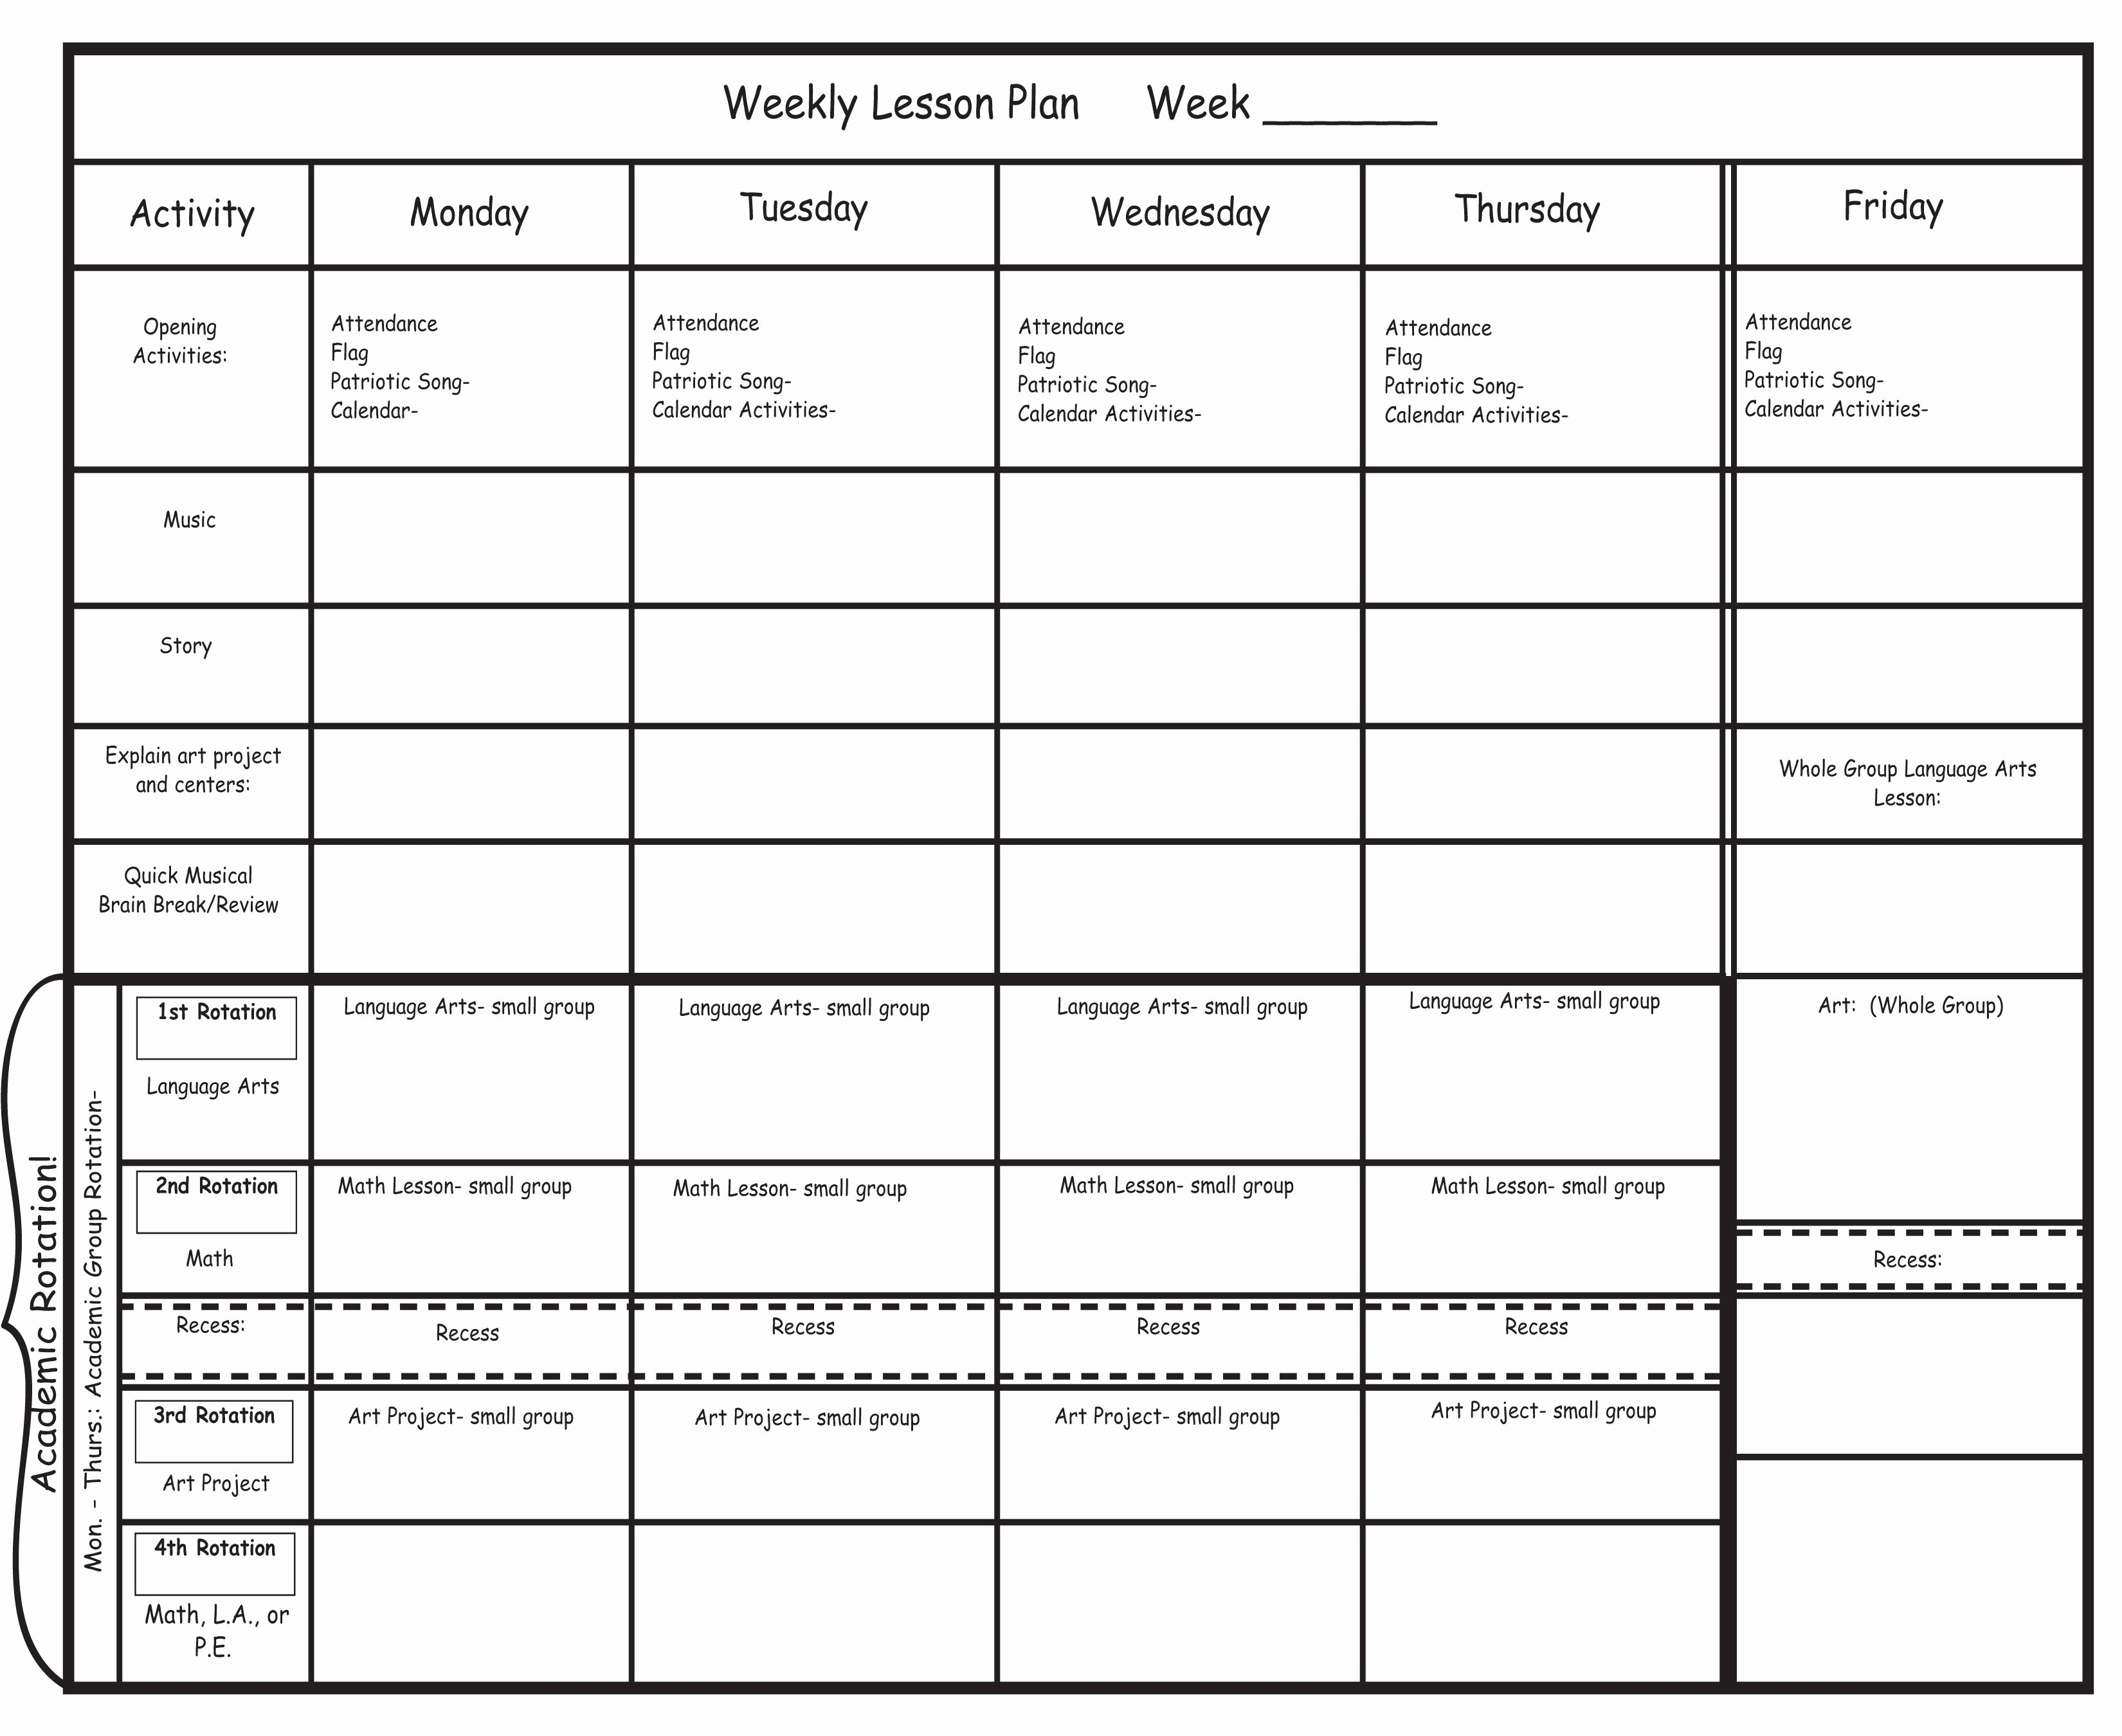 Blank Preschool Lesson Plan Template Elegant Blank Preschool Lesson Plan Template Pdfkindergarten